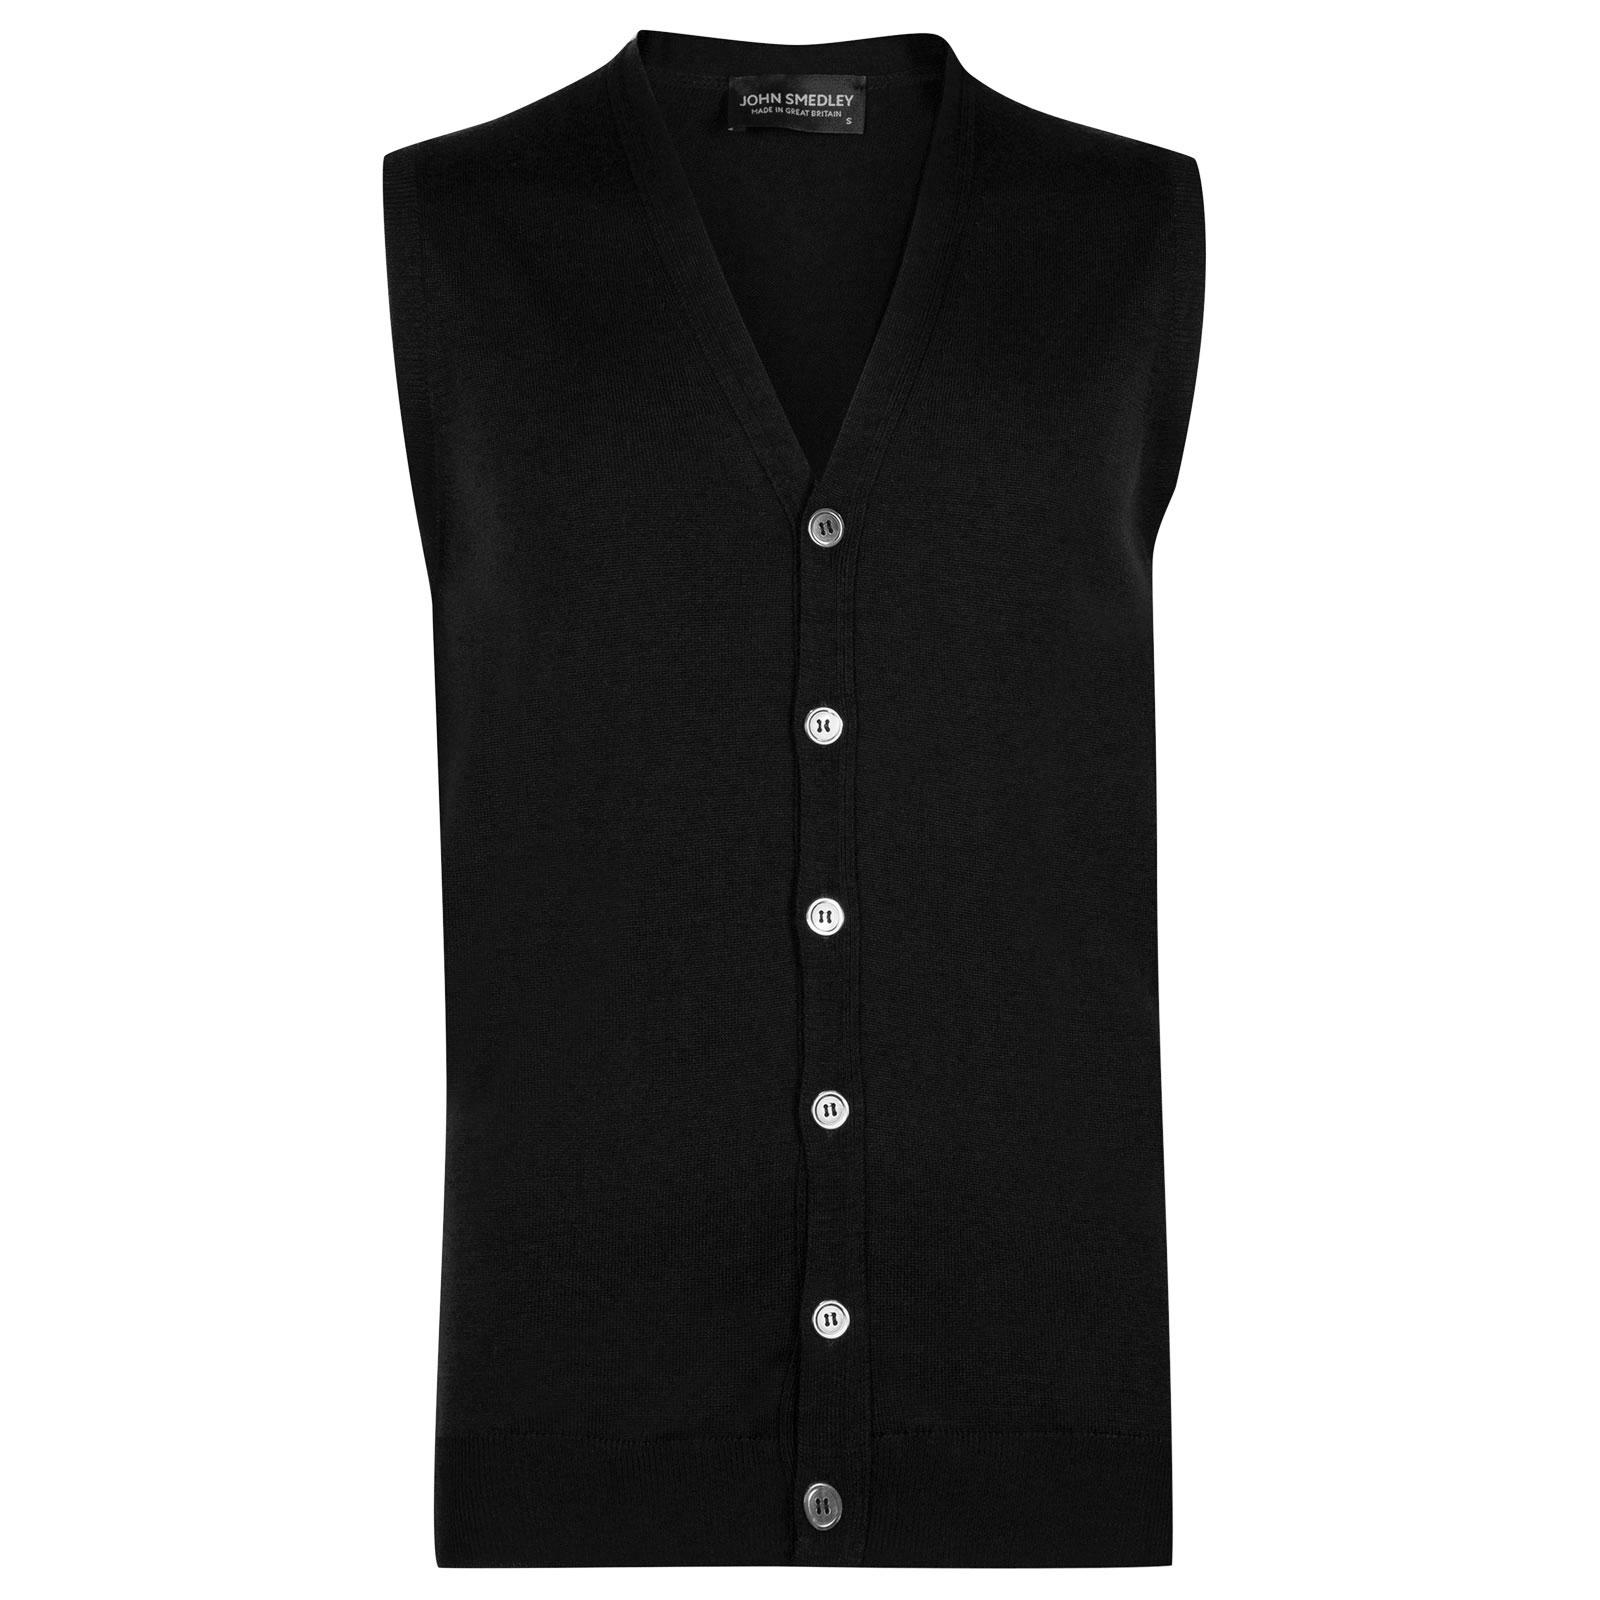 John Smedley stavely Merino Wool Waistcoat in Black-S